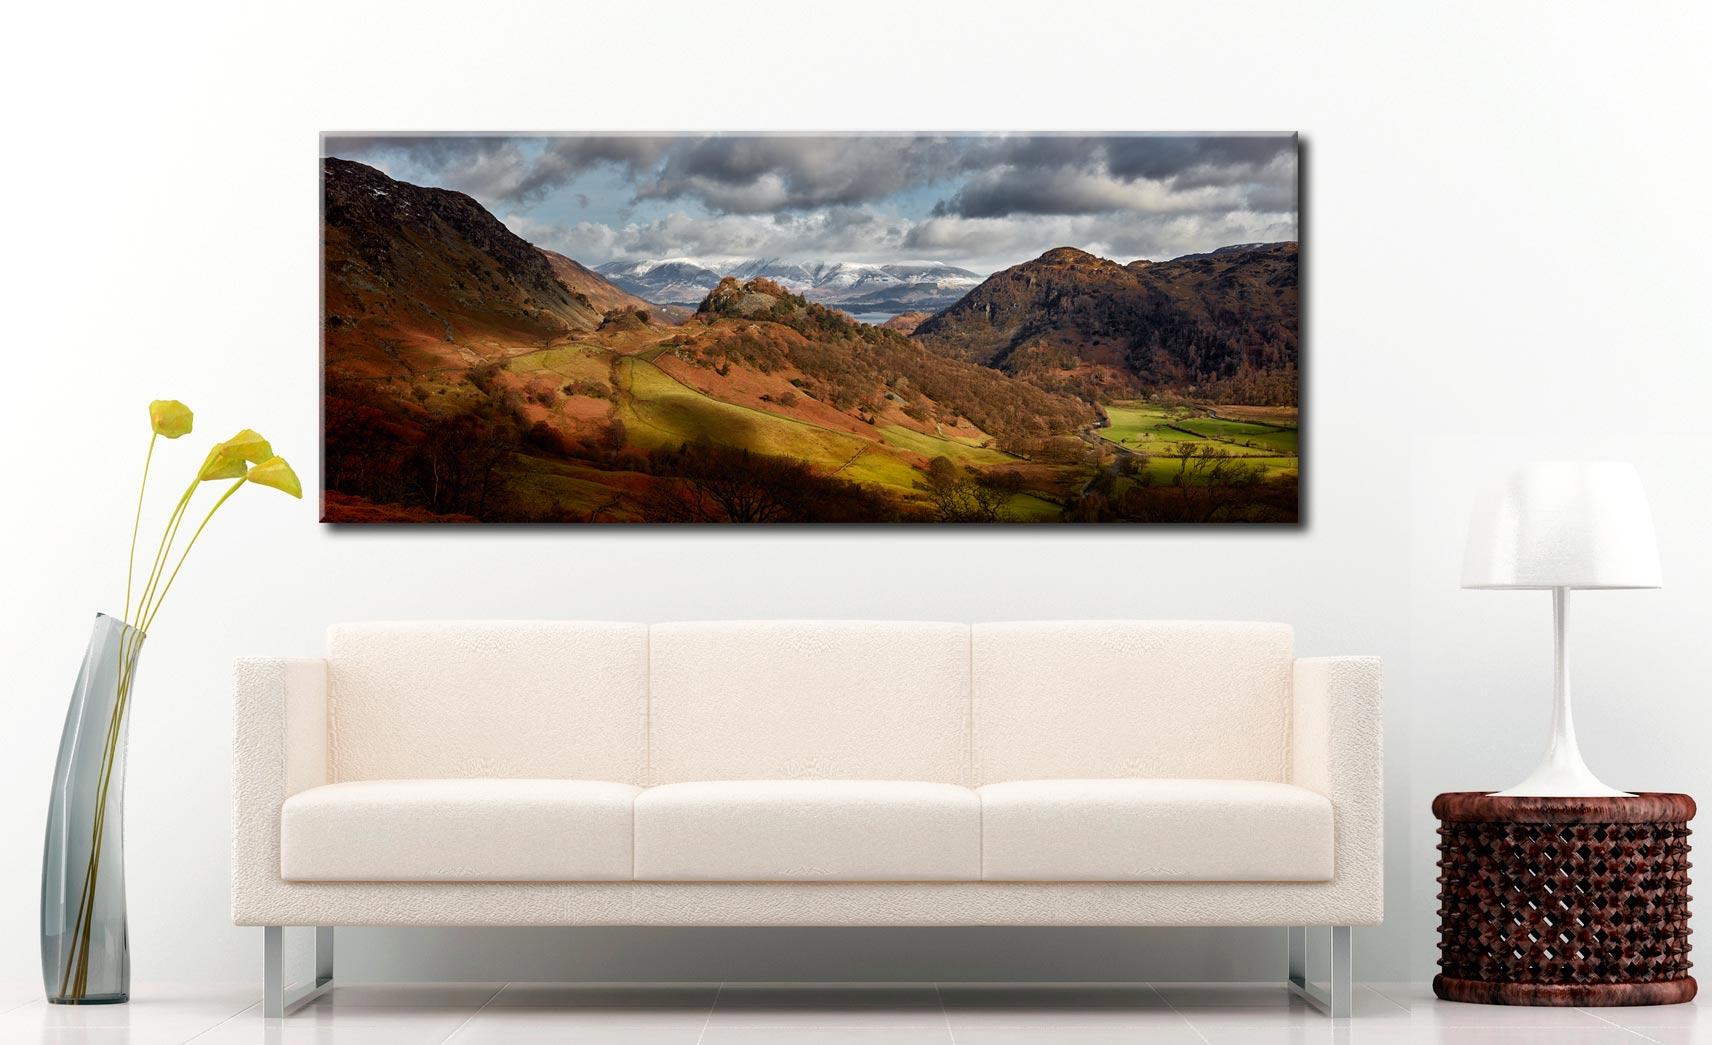 Castle Crag Winter Sunshine - Canvas Print on Wall